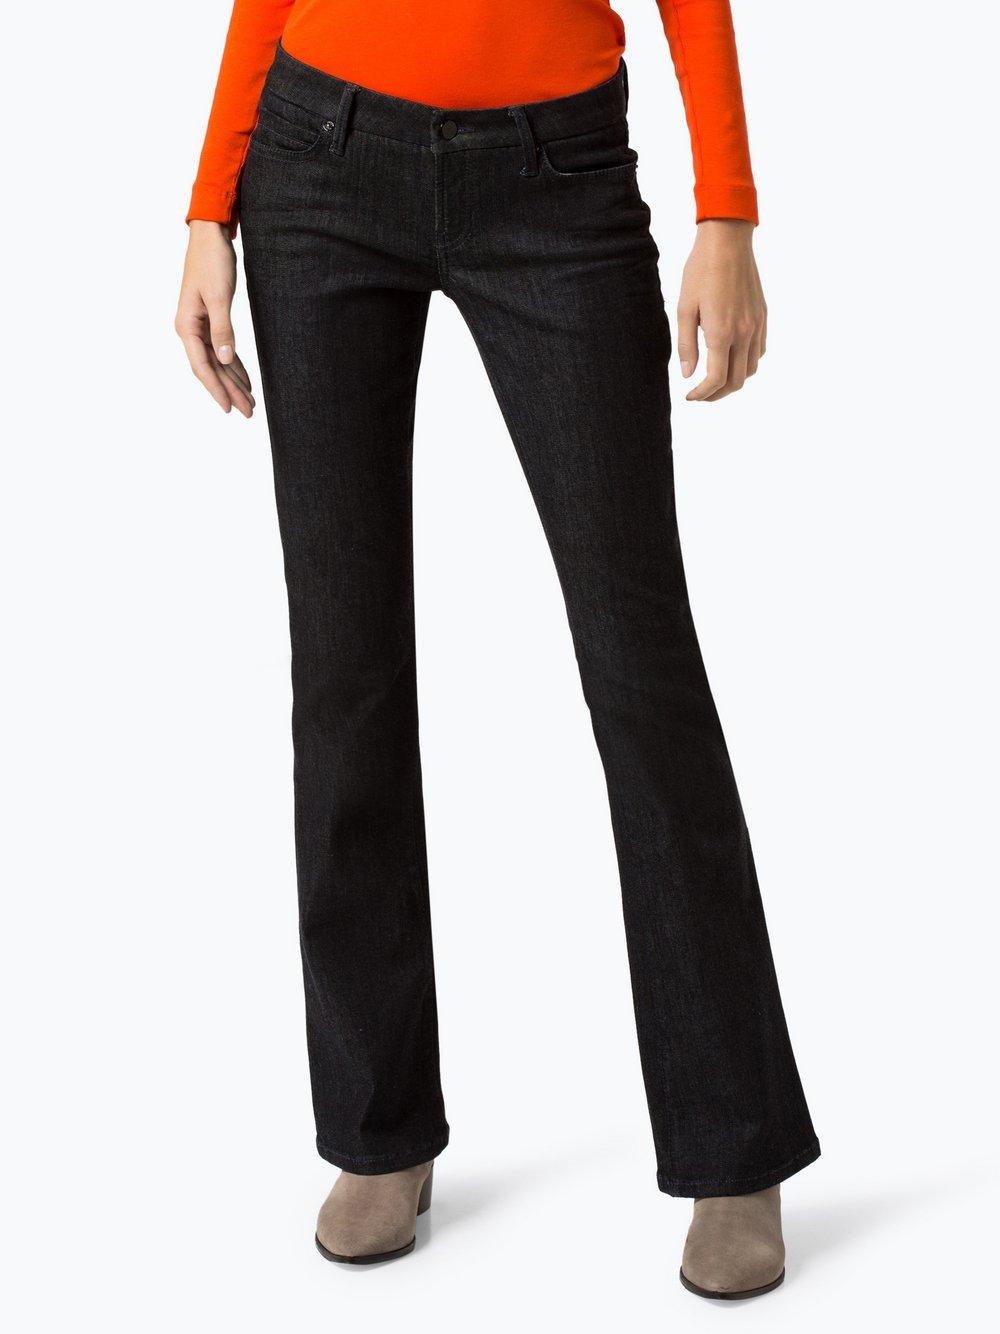 CAMBIO Lola Damen Jeans Größe 38